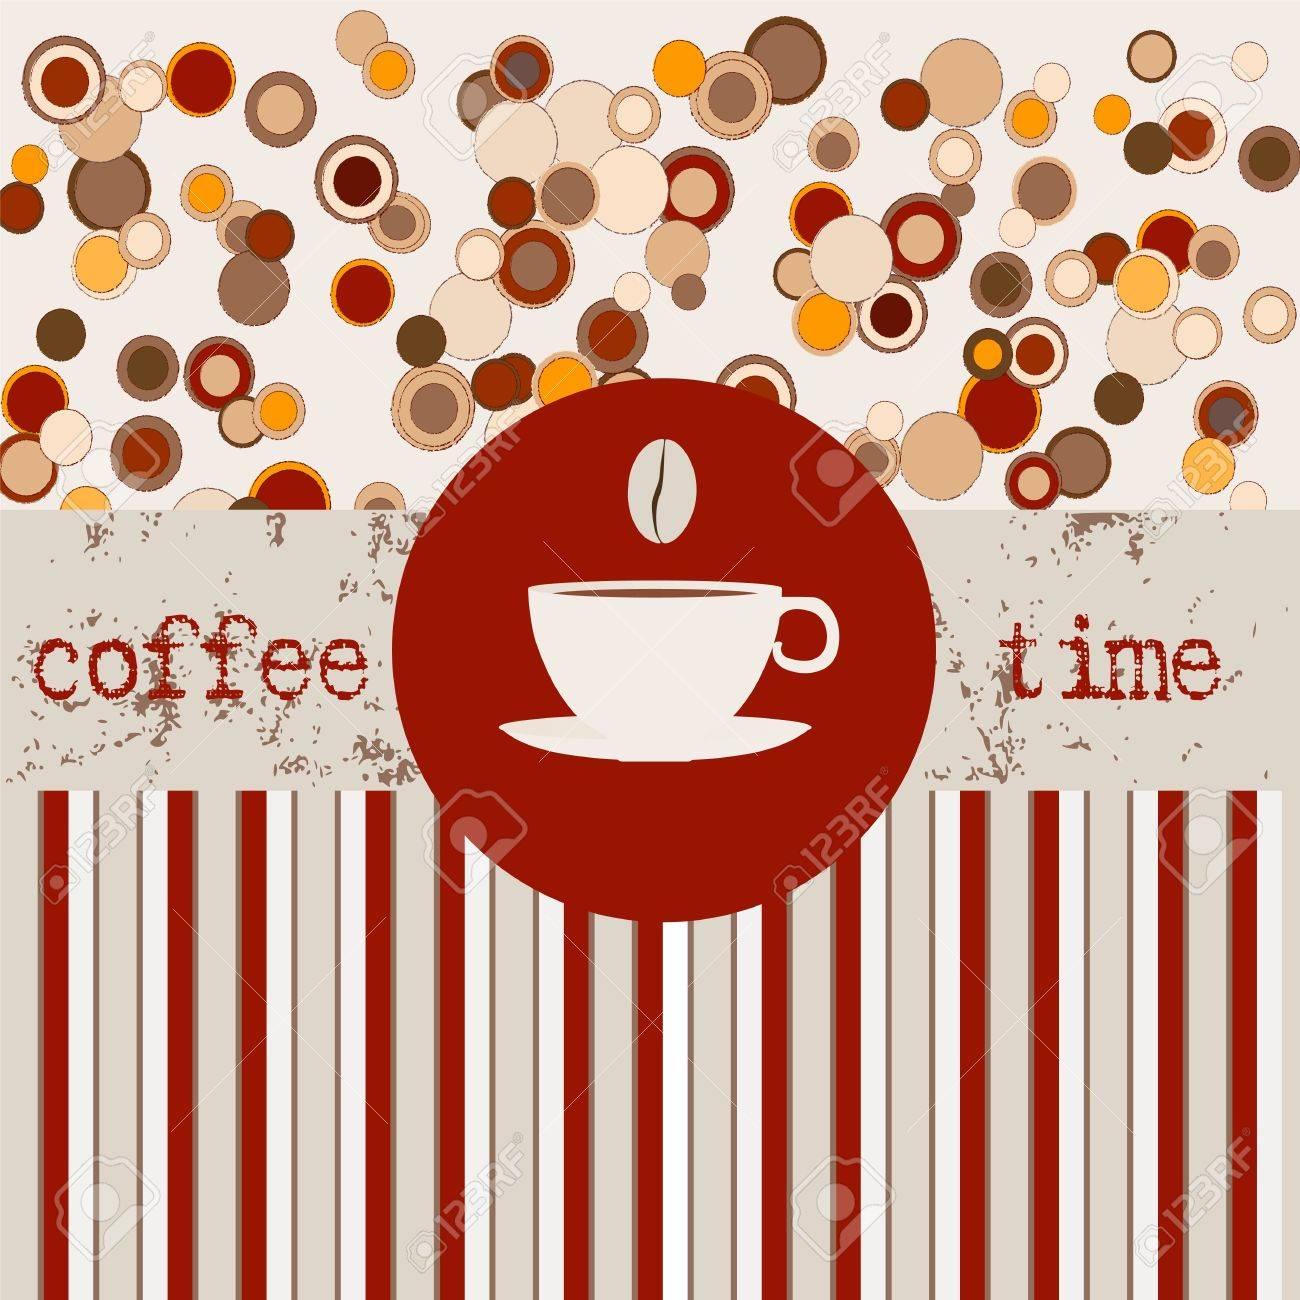 Coffee, design template,copy space Stock Vector - 13414911